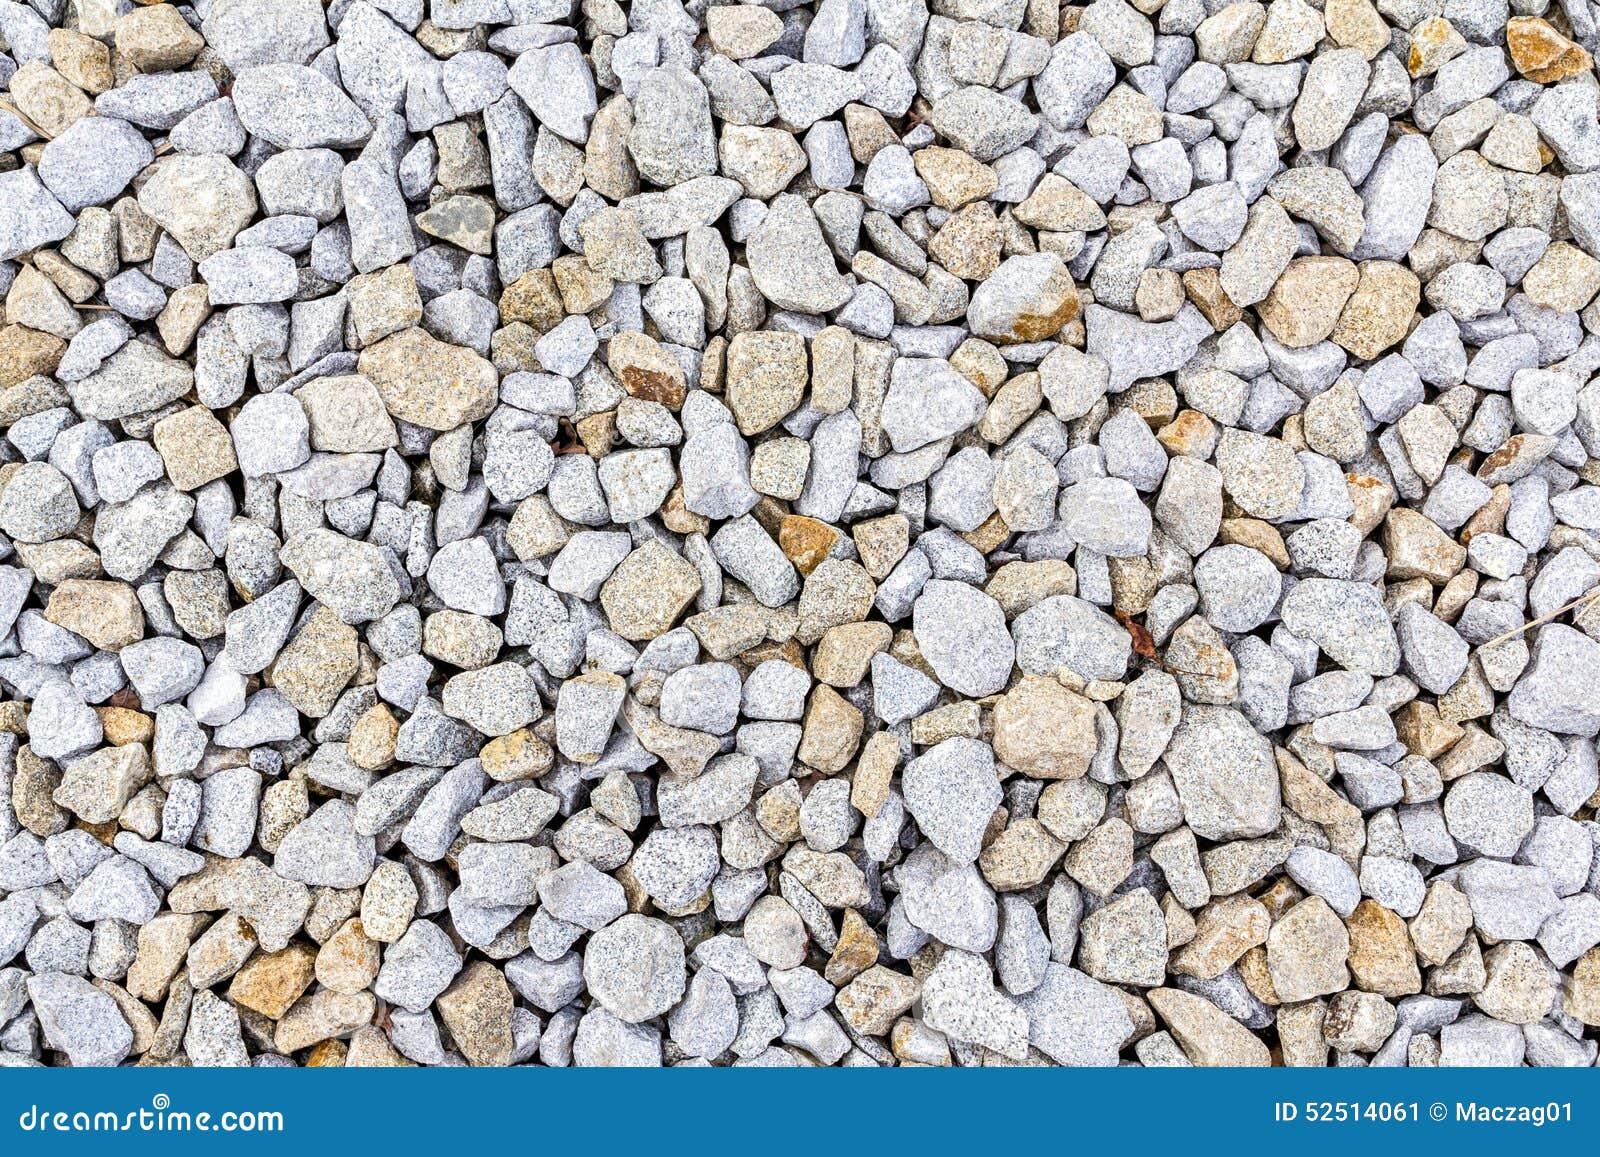 Crushed Stone Aggregate : Crushed rock gravel stock image cartoondealer